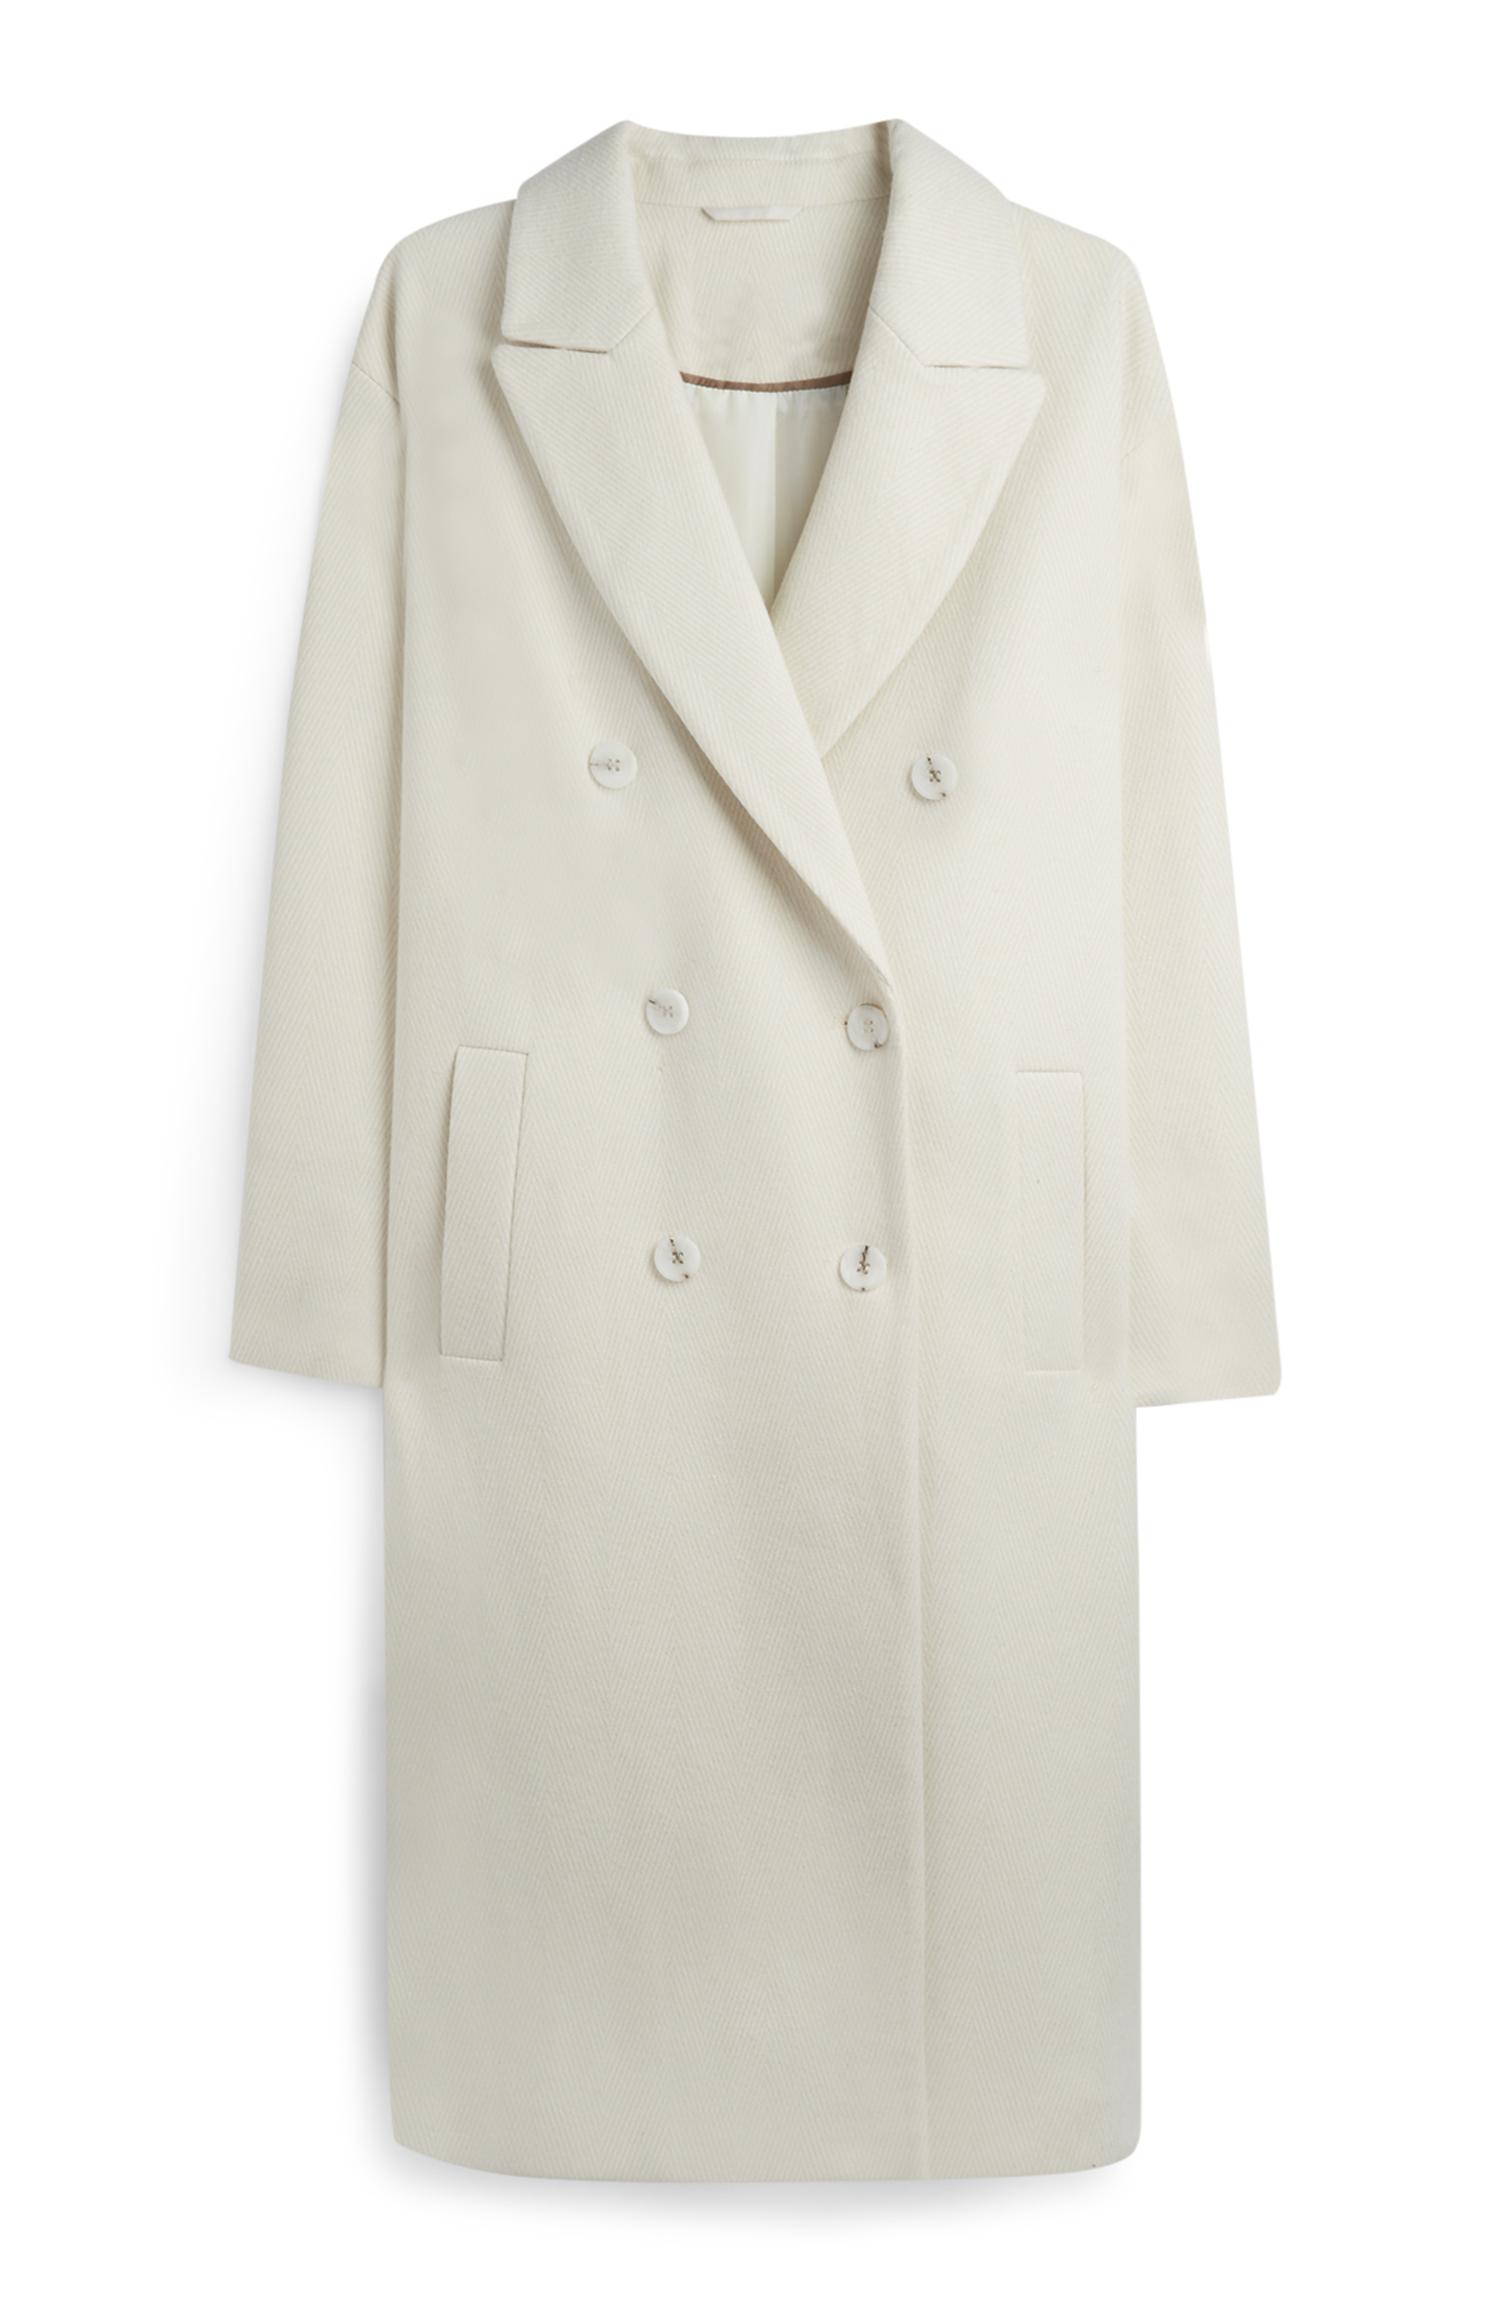 Herringbone longline coat, £30, Penny's